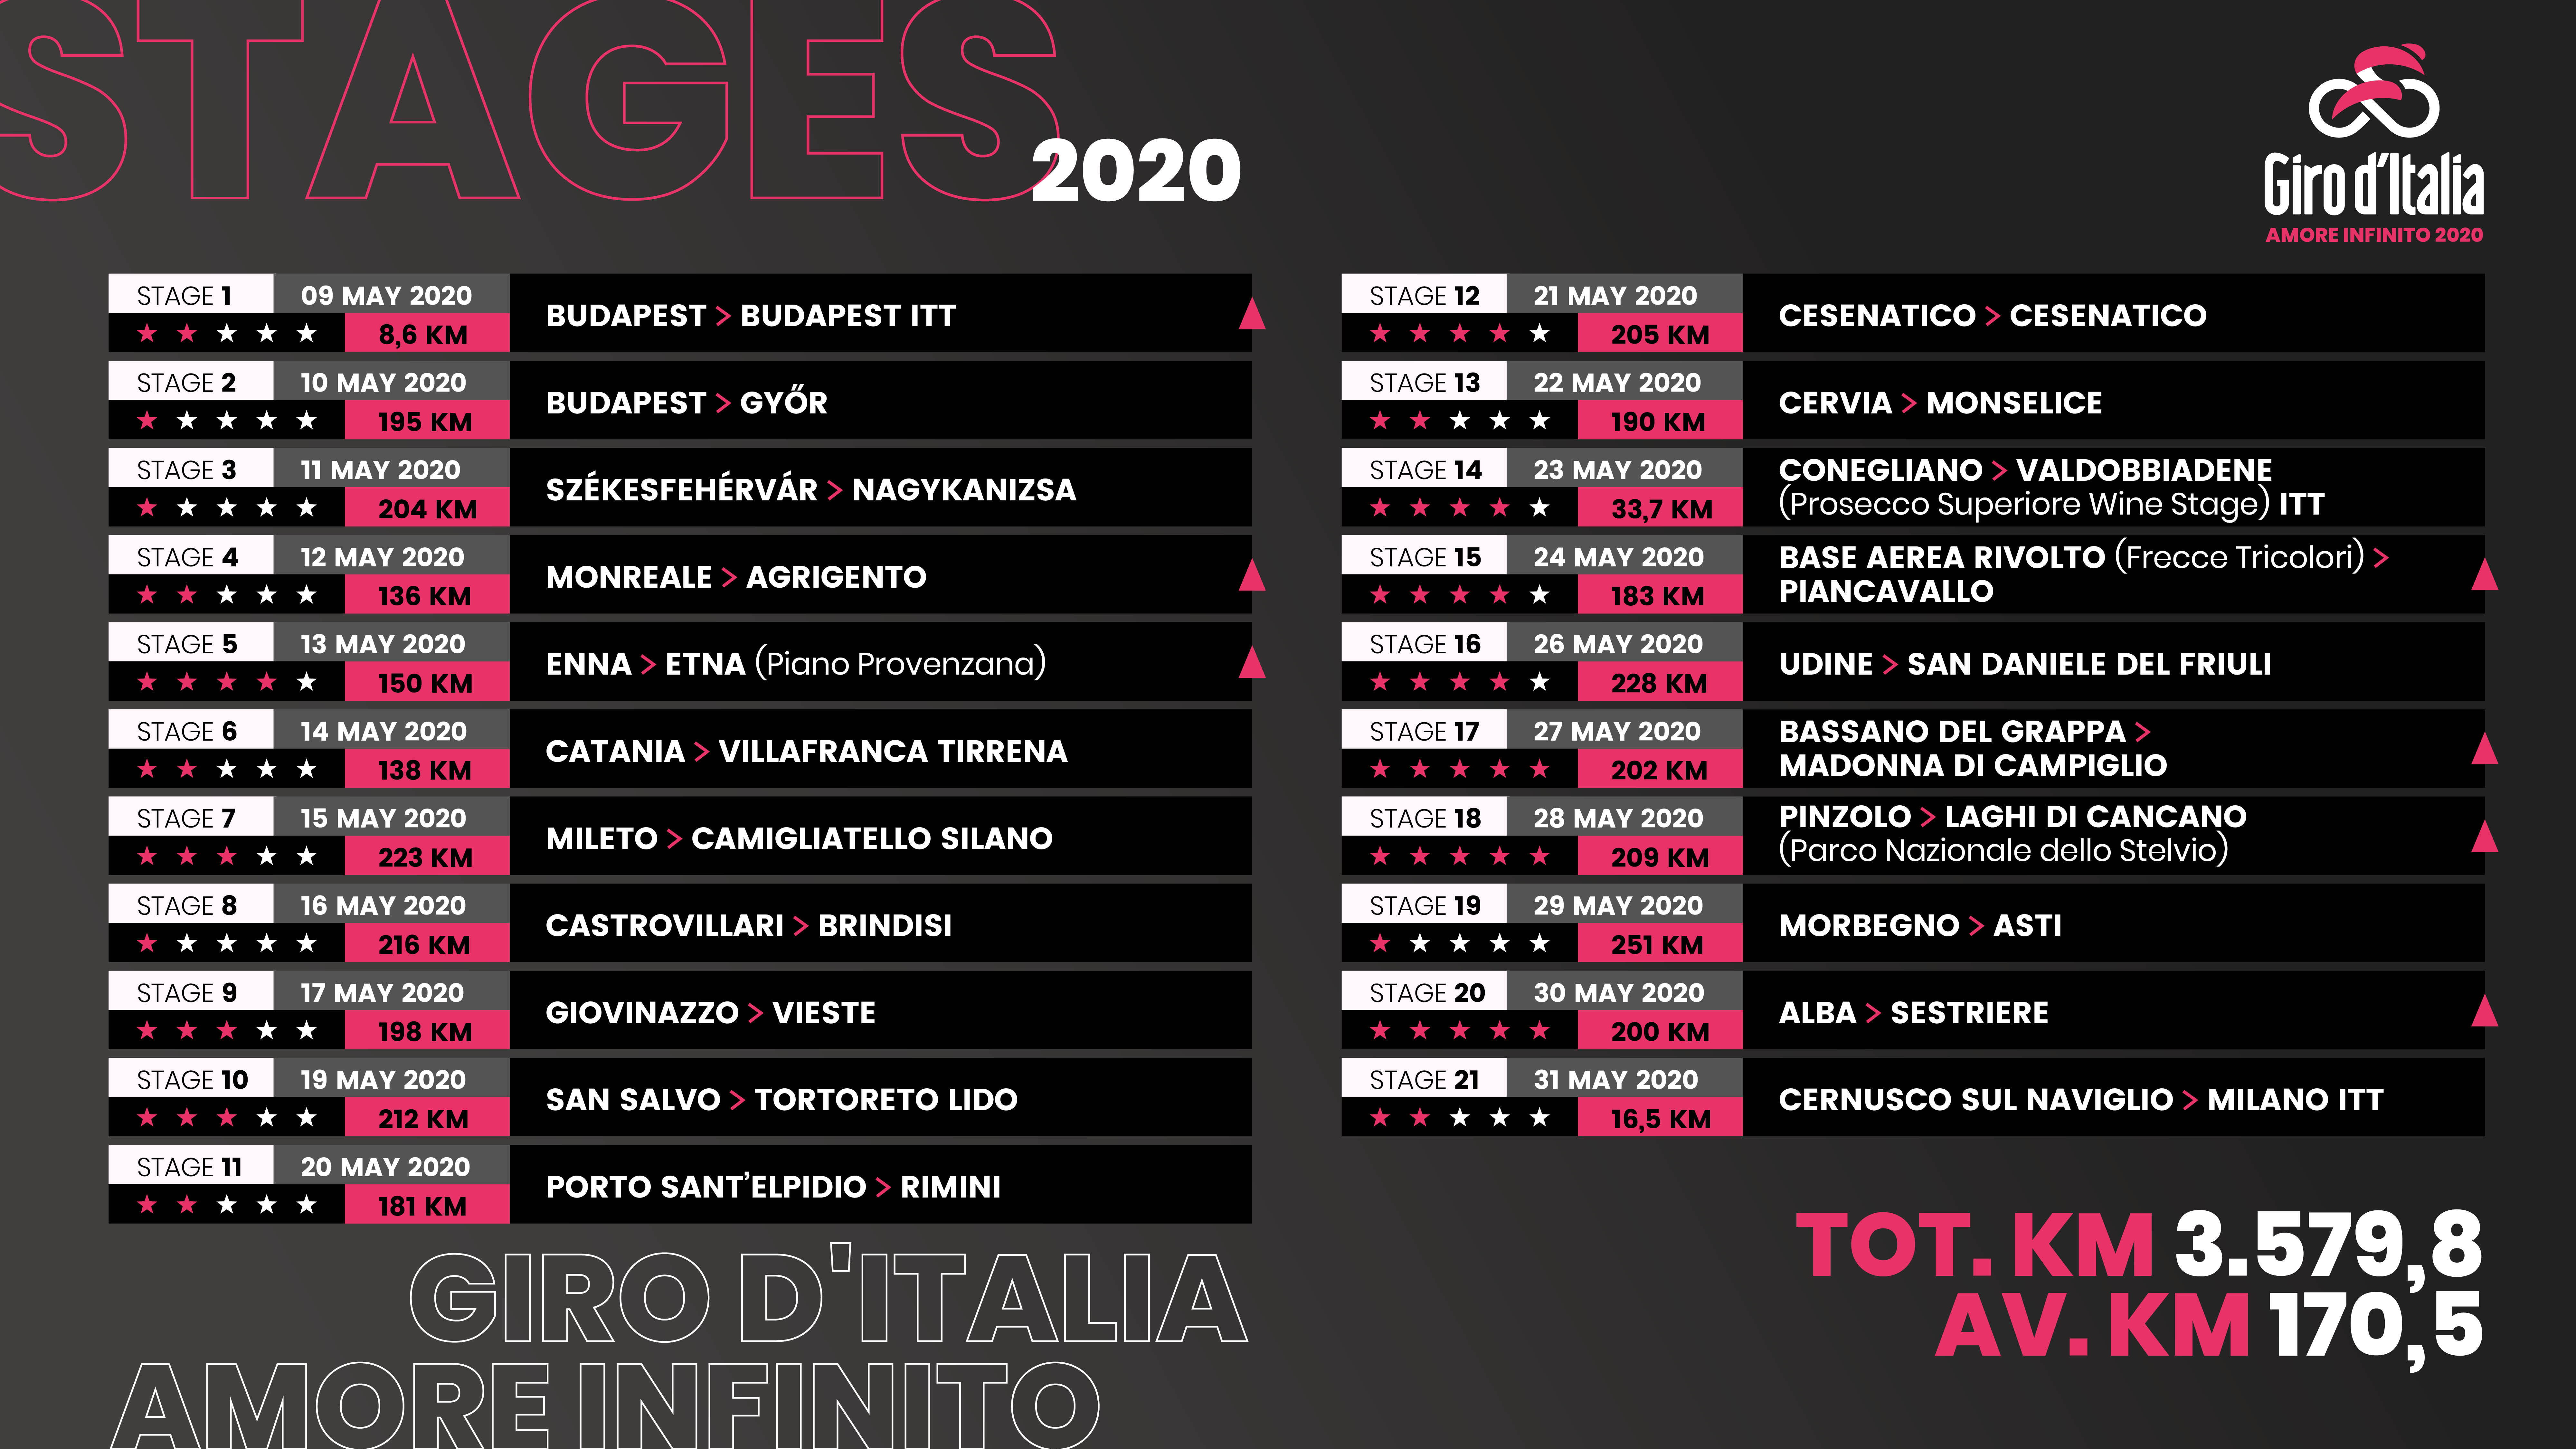 GIRO D'ITALIA 2020: ufficiali le tappe! Tappa-clou nel ...